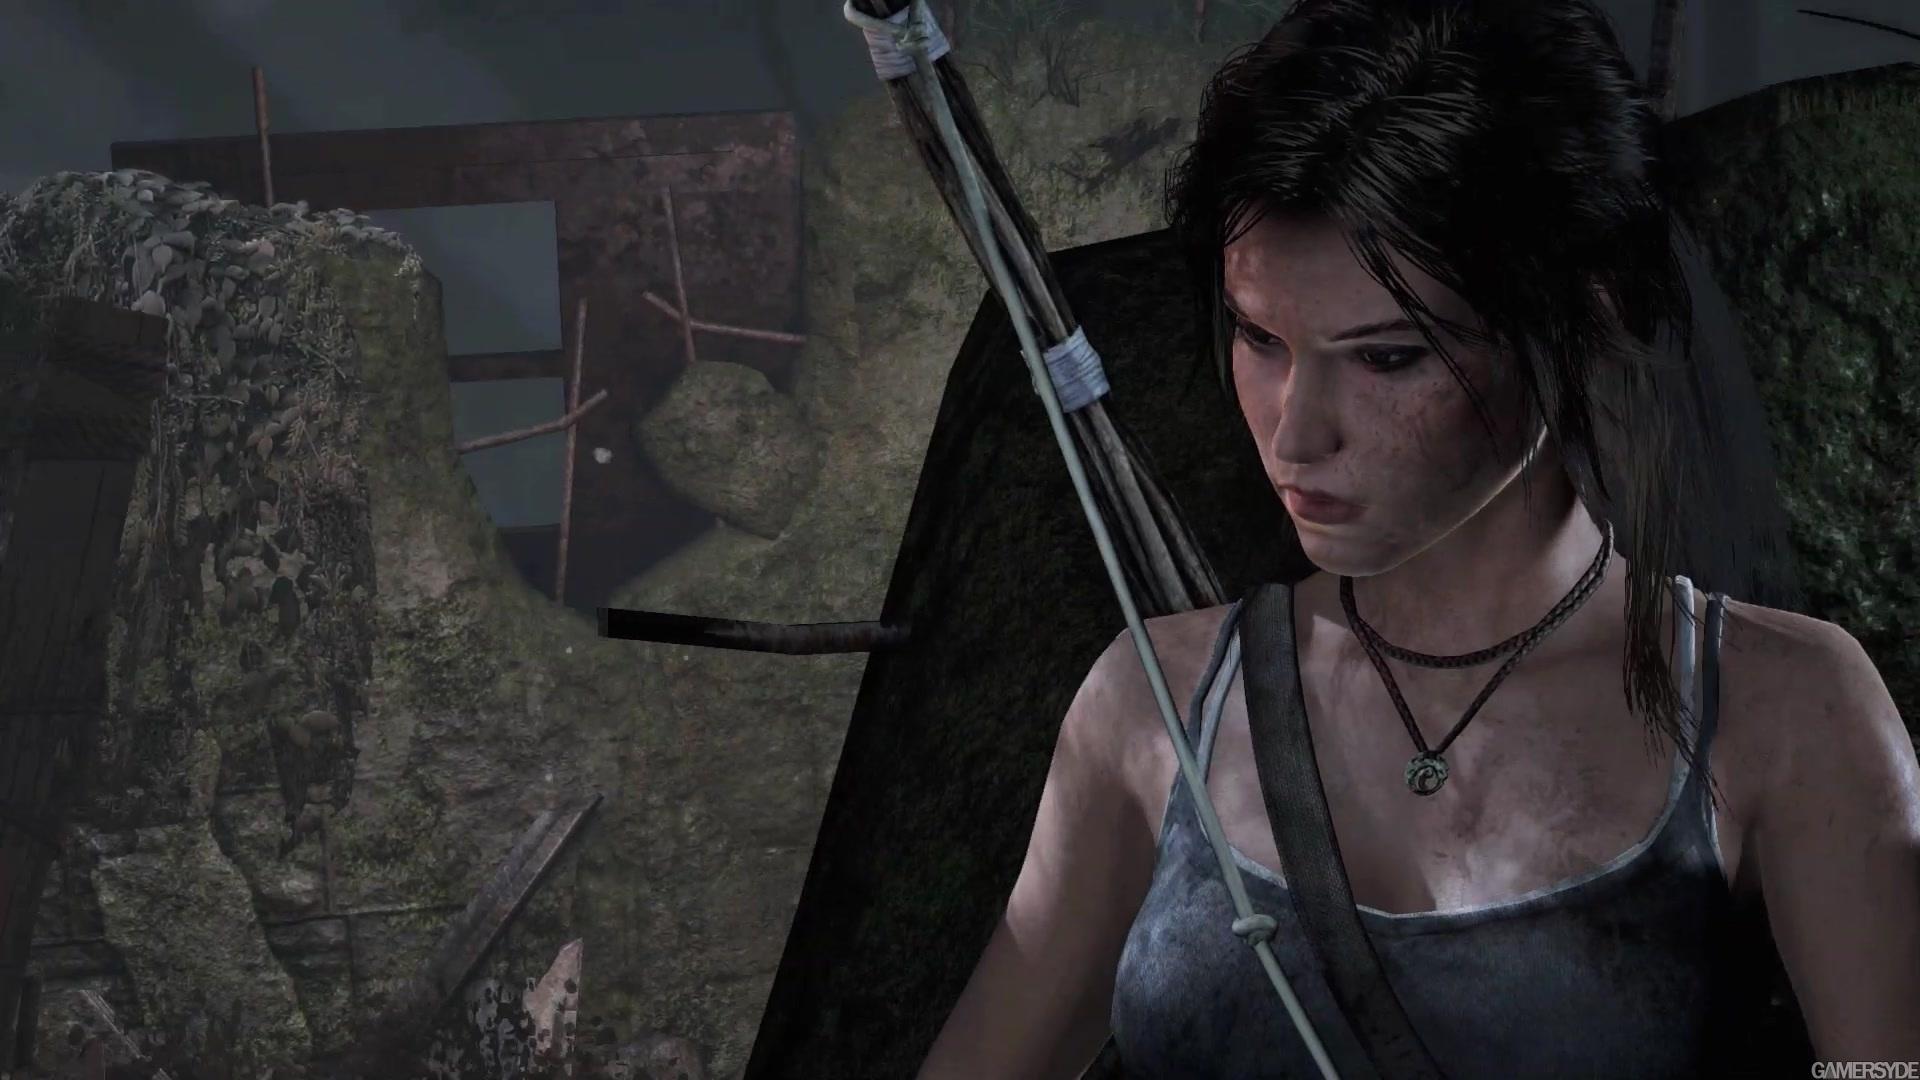 image tomb raider 24052 1912 0007 تصاویر جدیدی از عنوان Tomb Raider: Definitive Edition منتشر شد